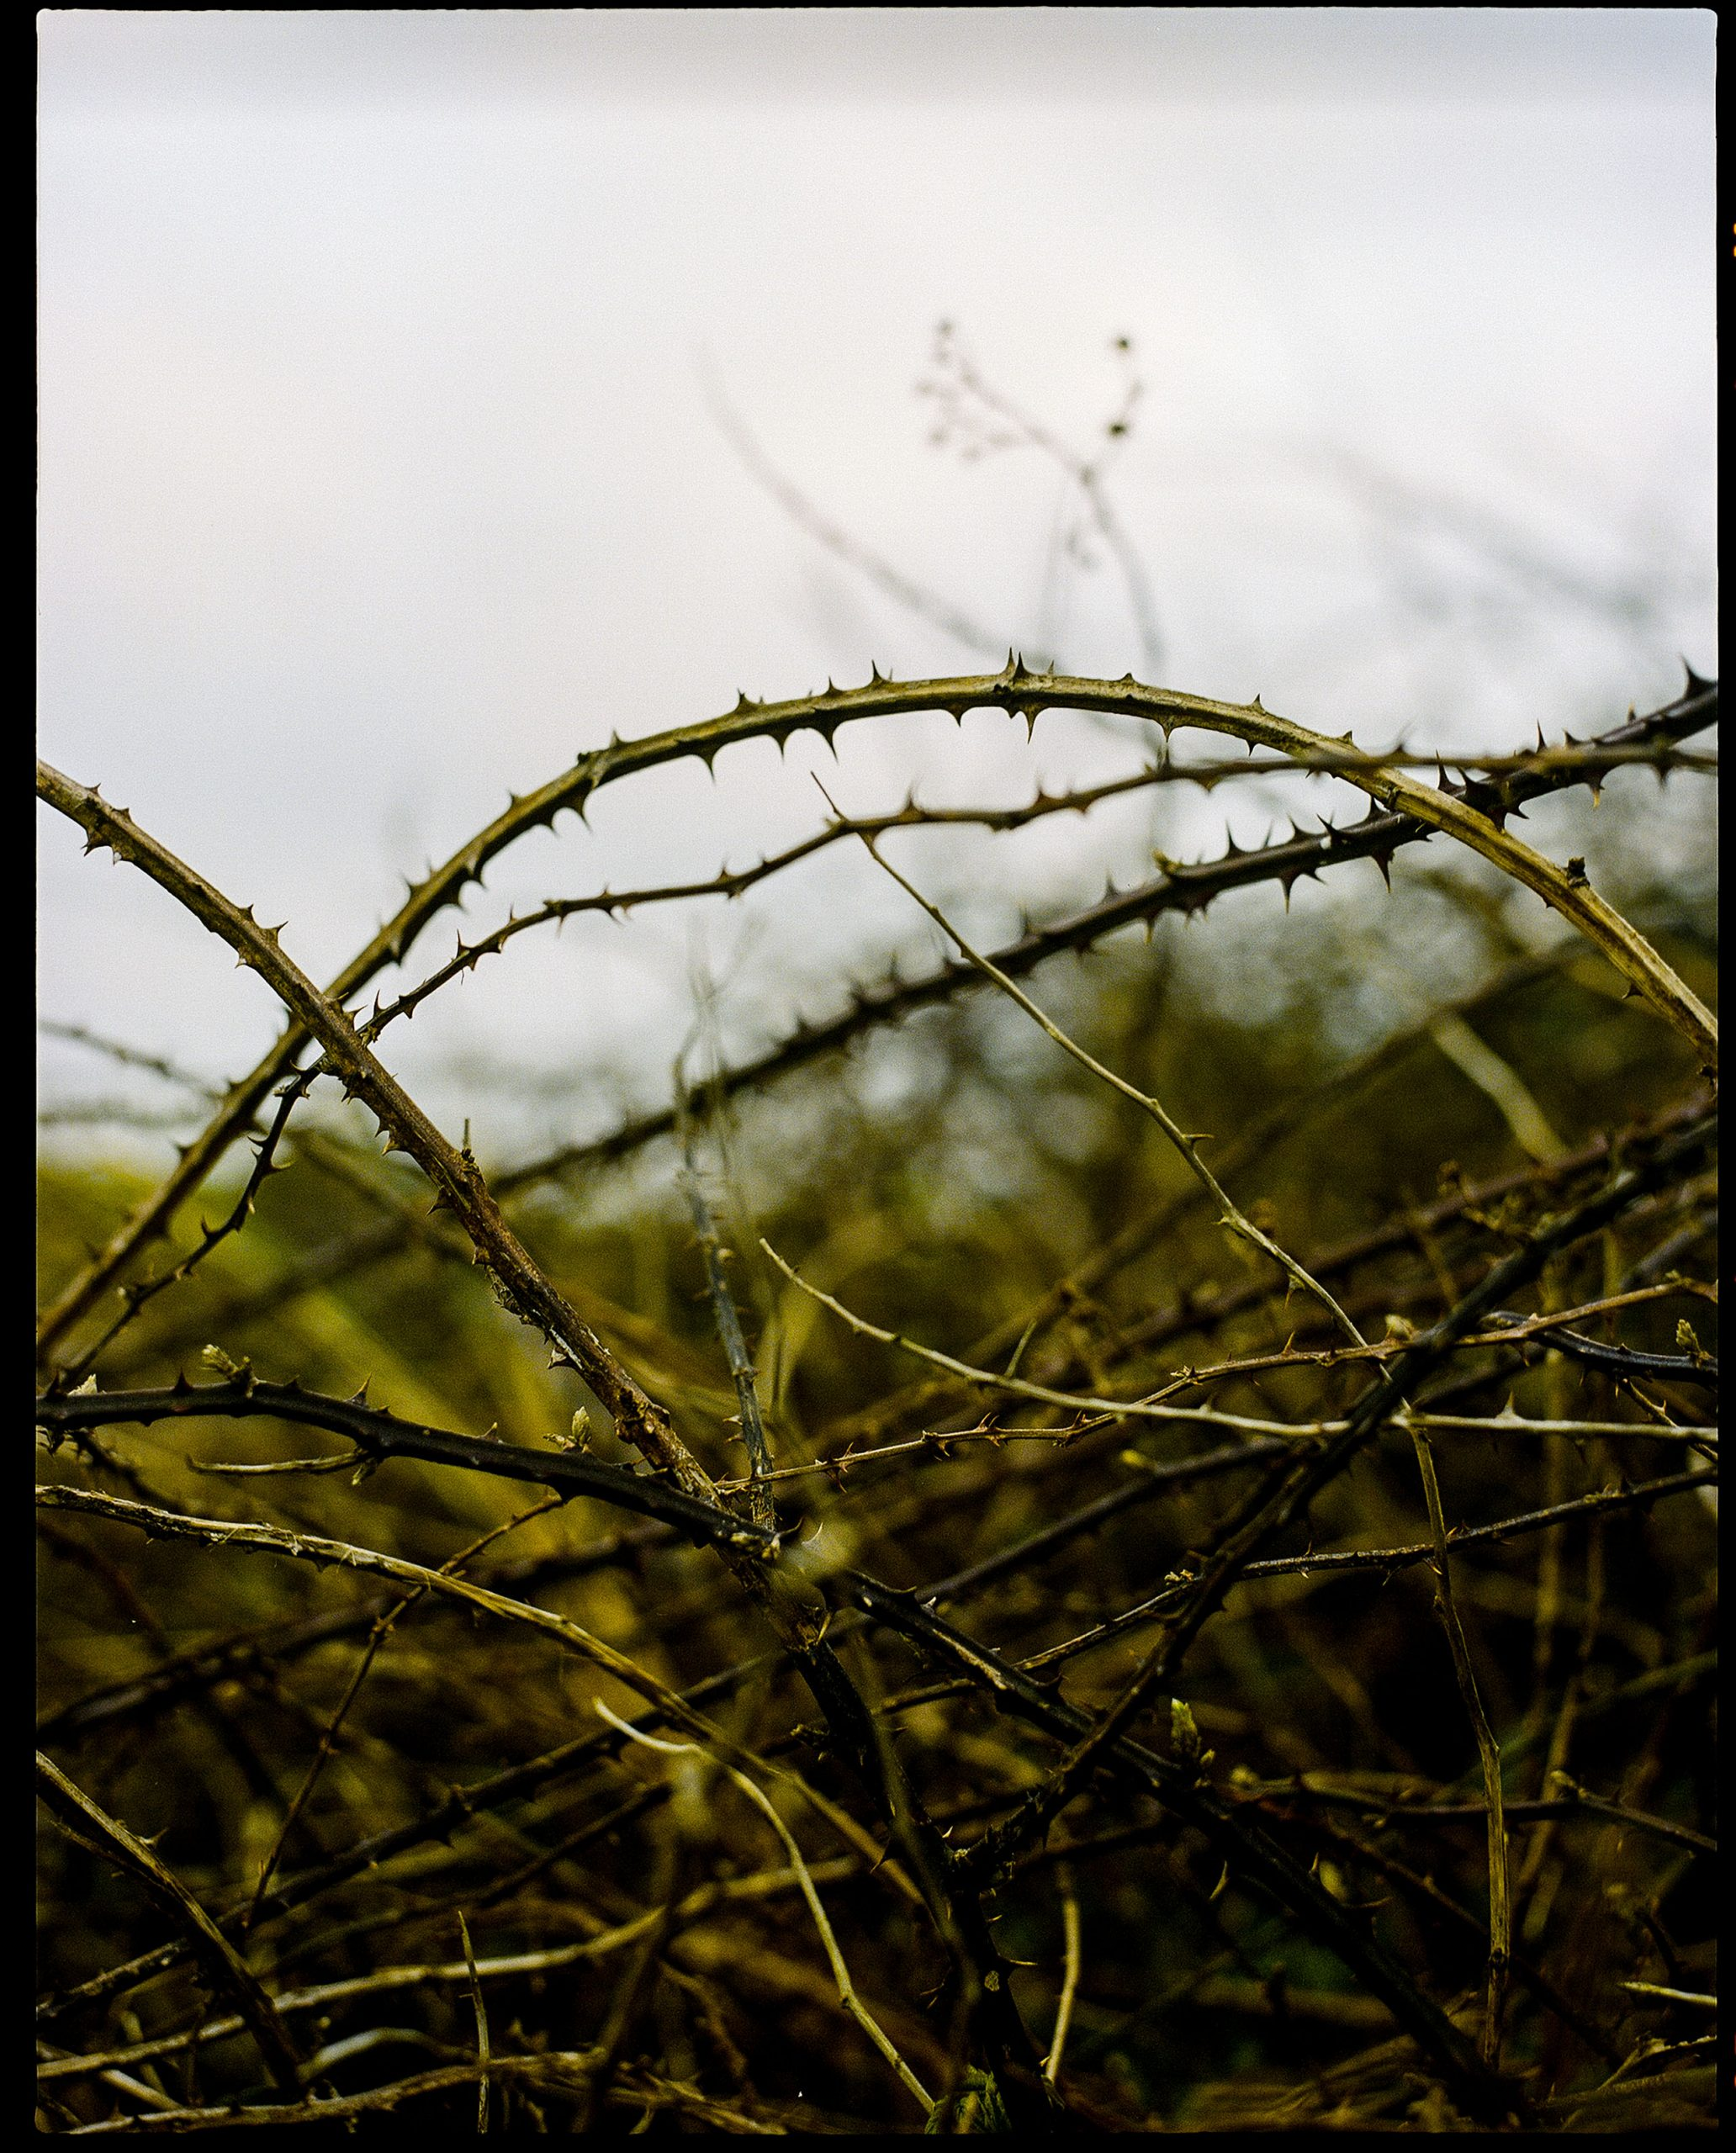 Thorns at Muirfield